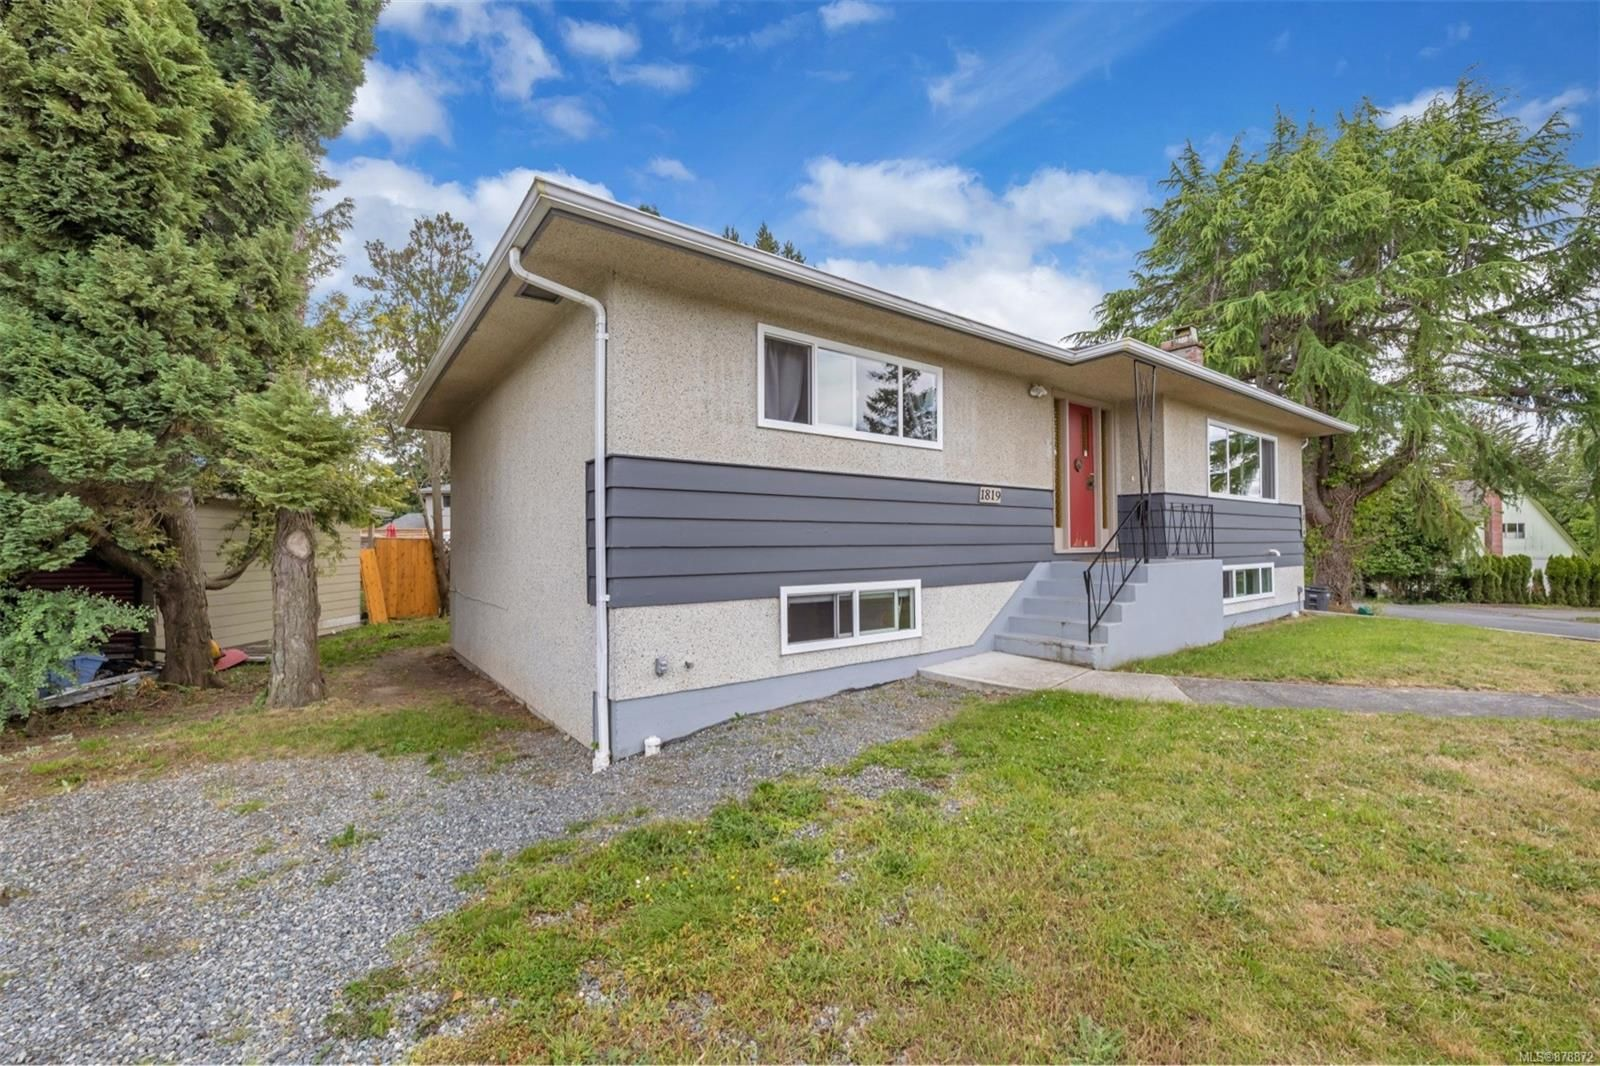 Main Photo: 1819 Dunnett Cres in : SE Gordon Head House for sale (Saanich East)  : MLS®# 878872